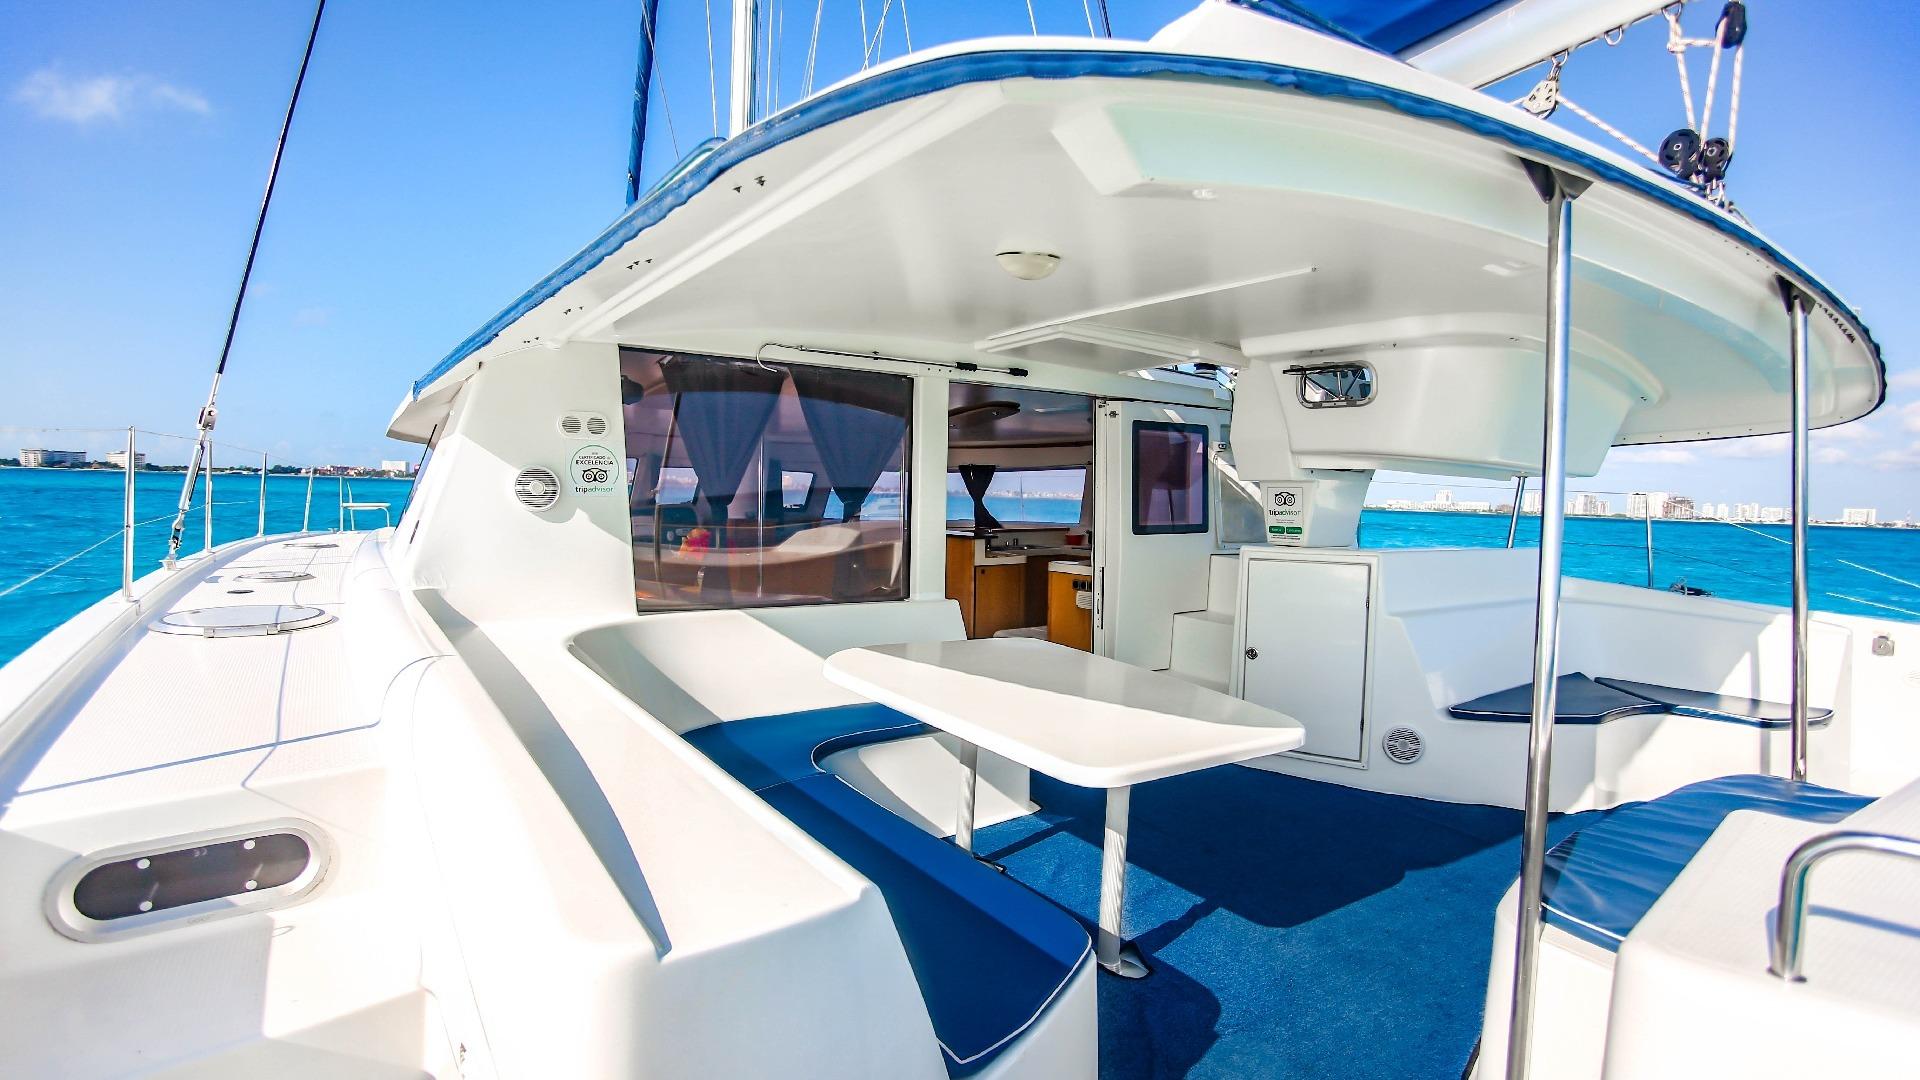 6 - LowRes Megaira- Private tour to Isla Mujeres in catamaran - Cancun Sailing